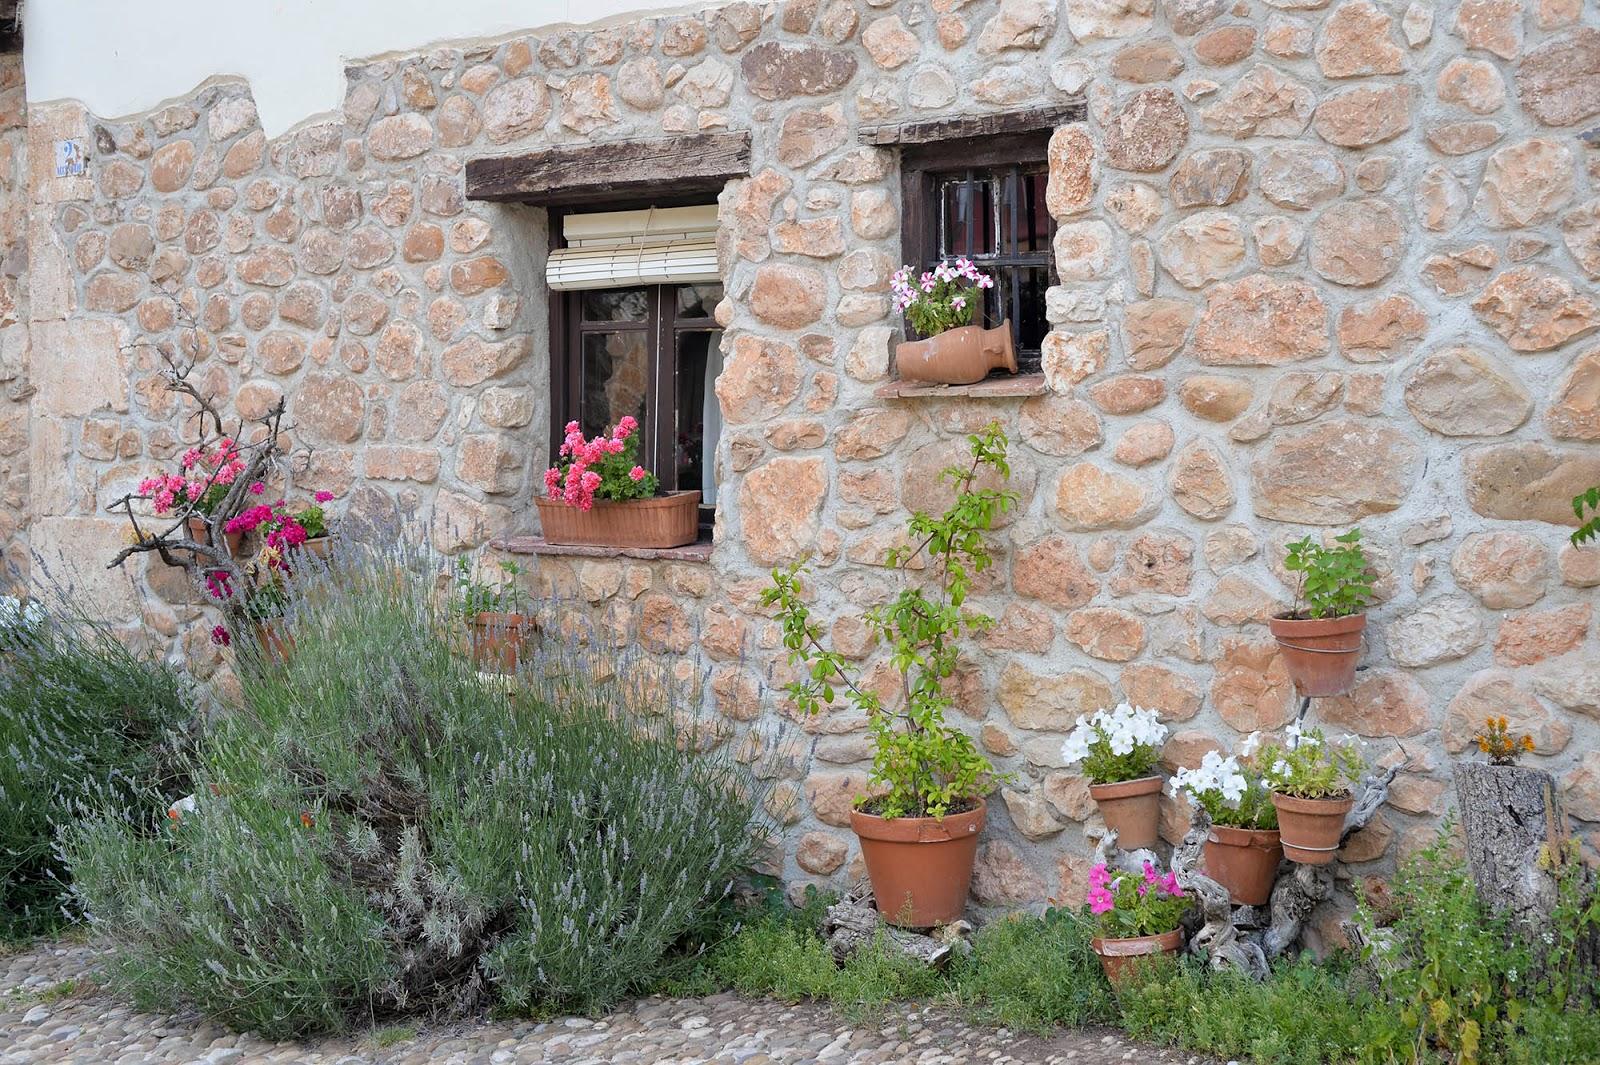 covarrubias burgos spain castile leon beautiful village